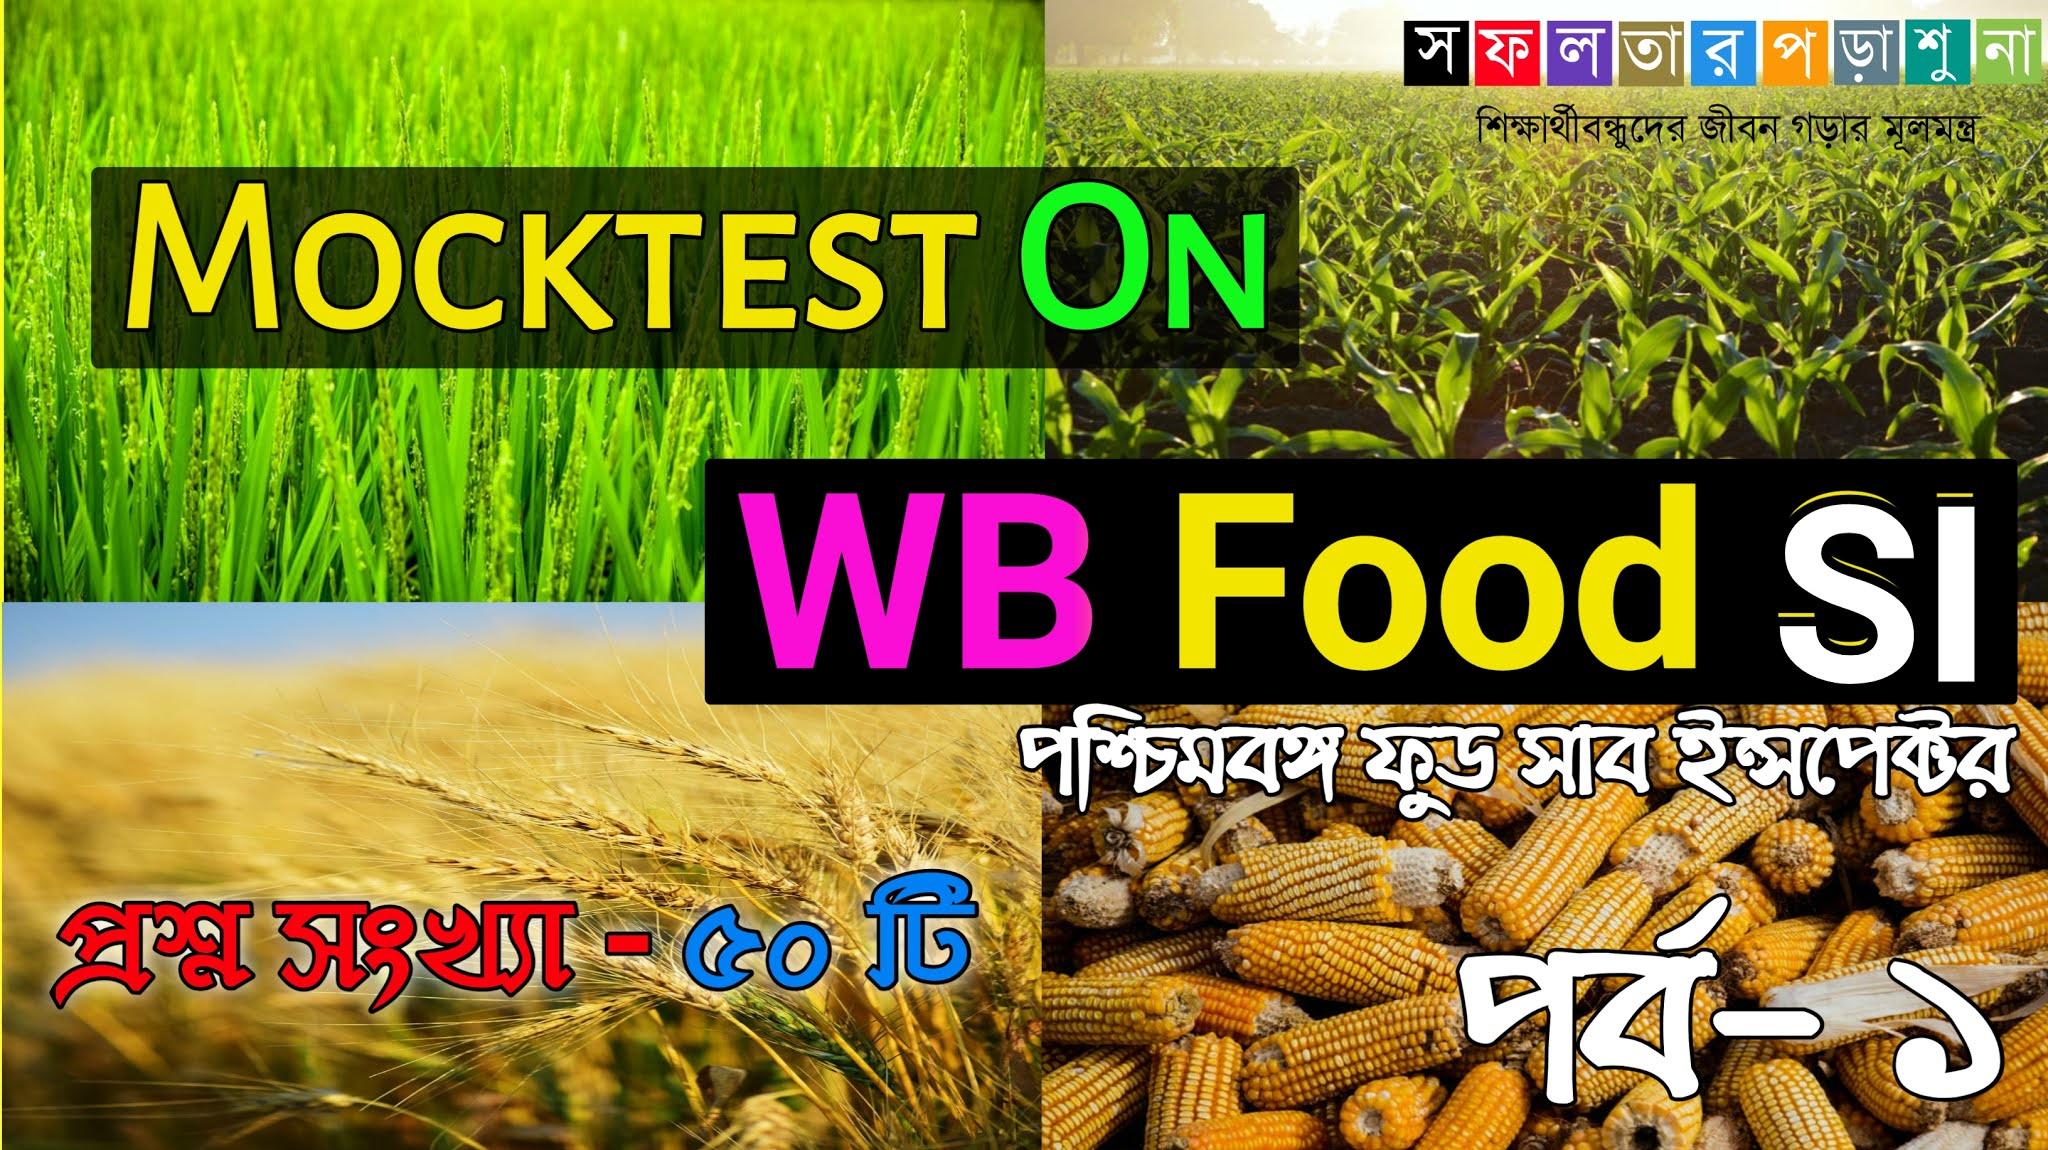 WBPSC Food SI Exam Online Mock Test in Bengali (Part-1) - অনলাইন মক টেস্ট - পশ্চিমবঙ্গ ফুড সাব ইন্সপেক্টর